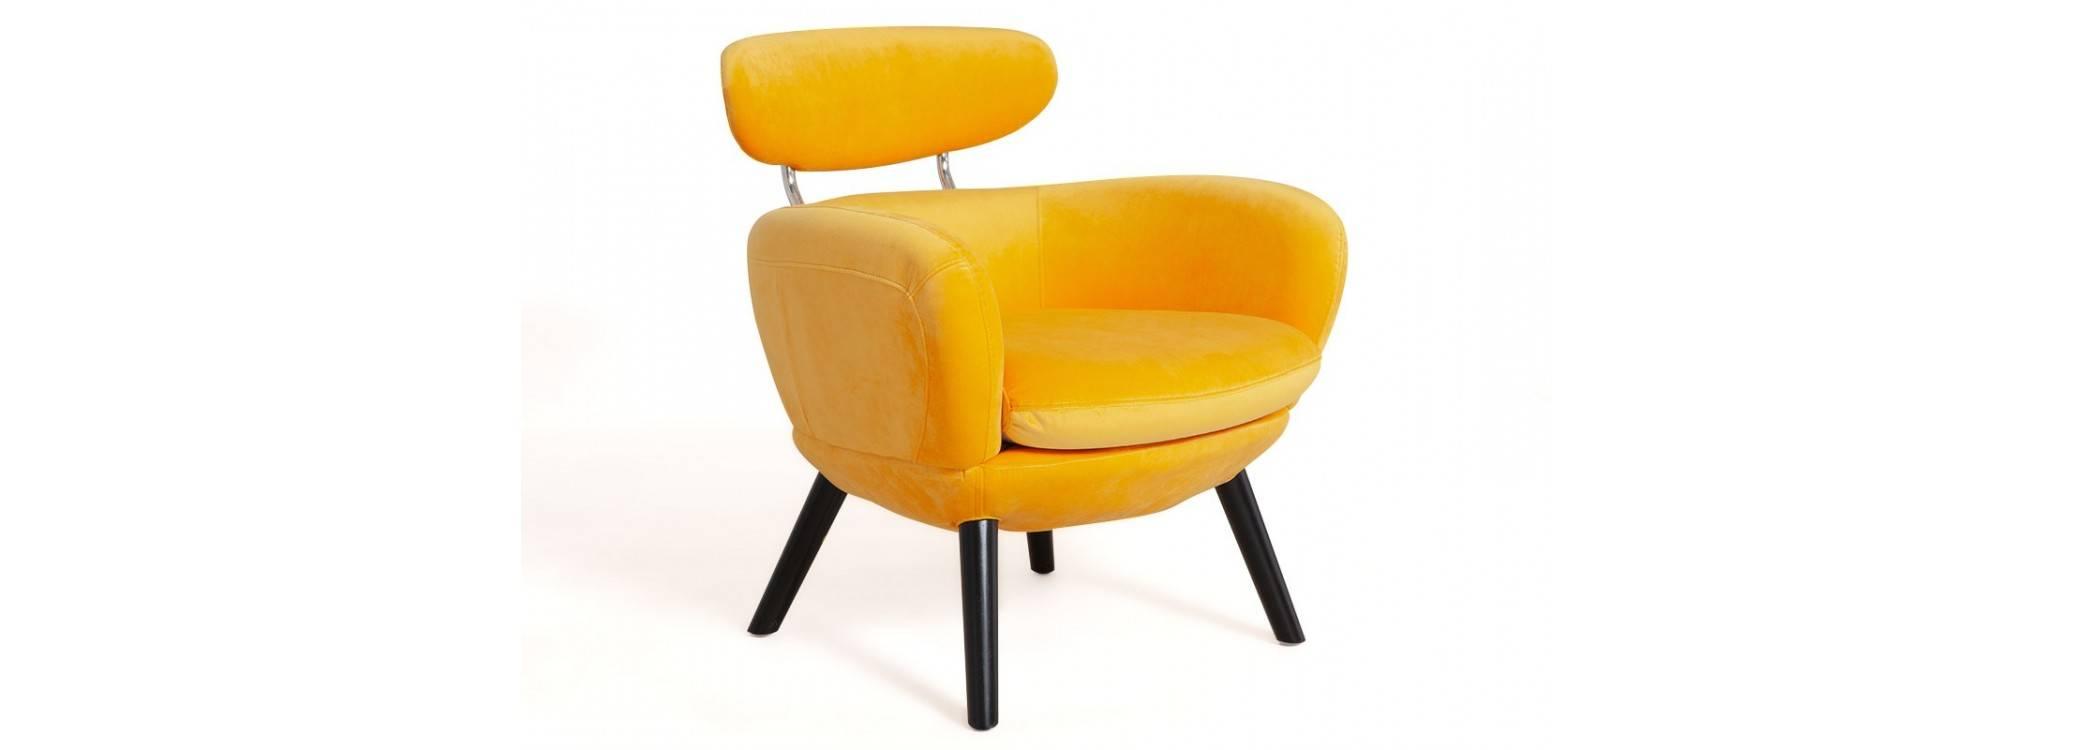 Fauteuil Rubis - velours jaune orangé